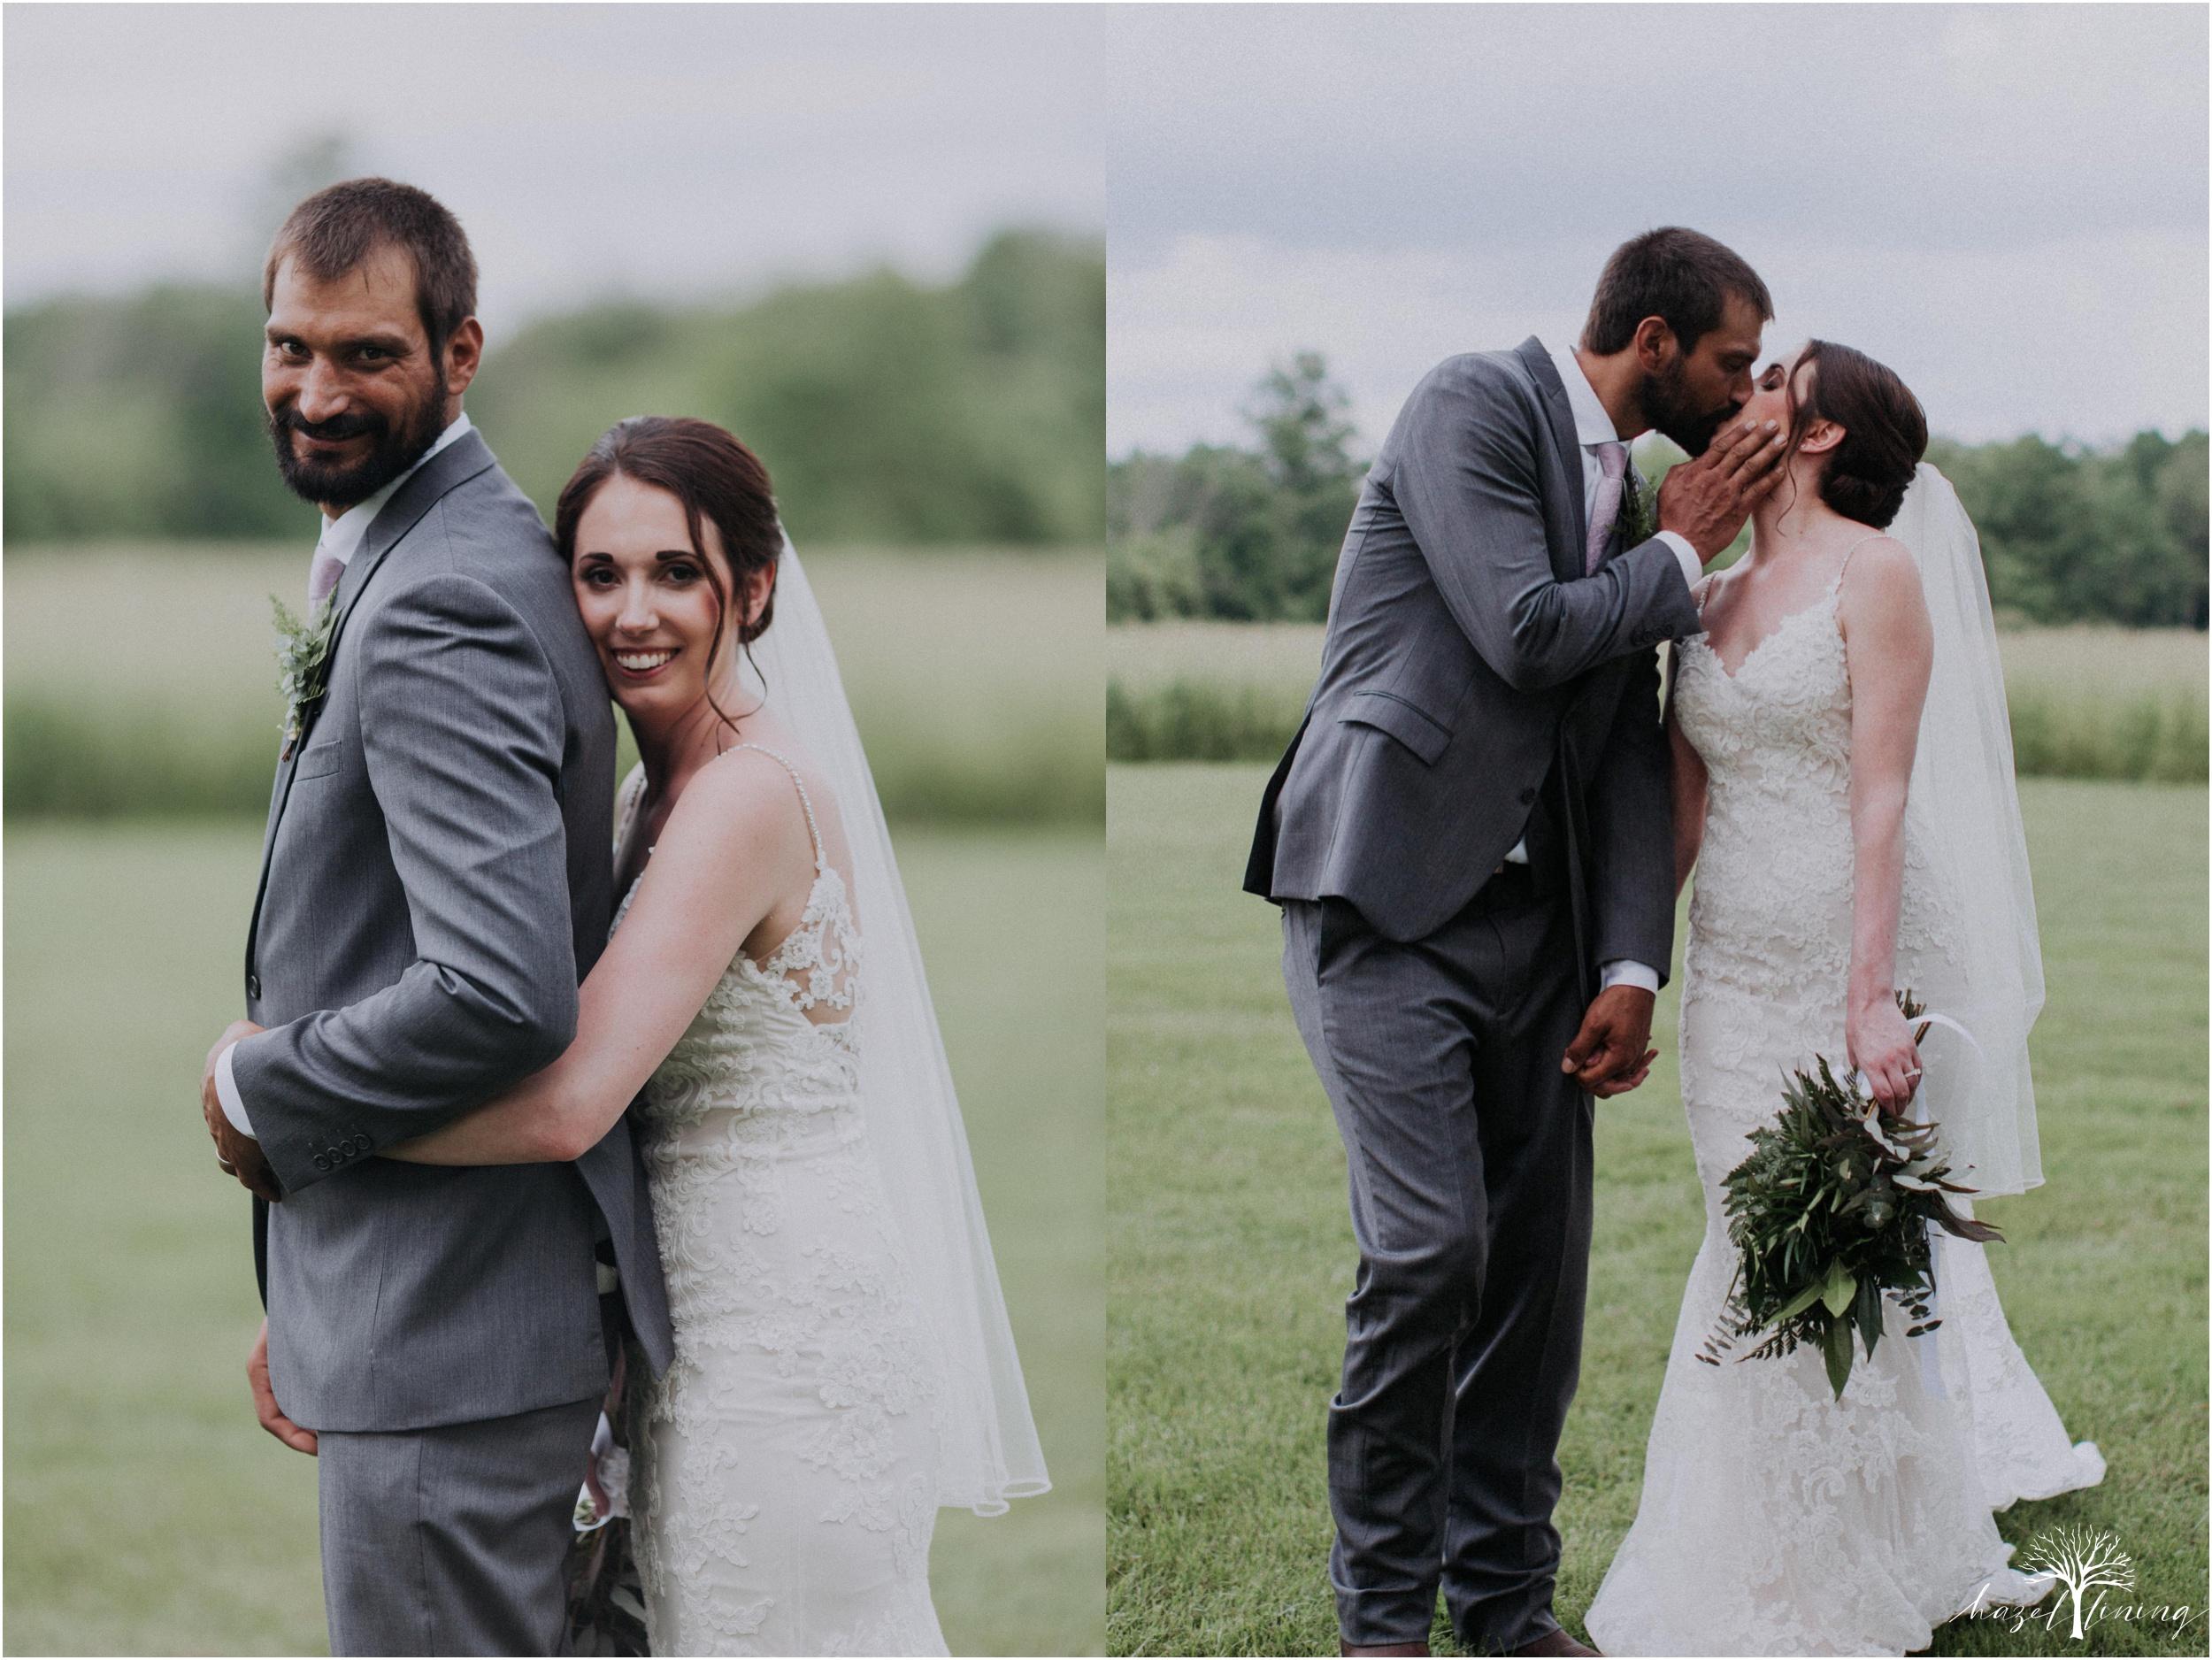 hazel-lining-travel-wedding-elopement-photography-lisa-landon-shoemaker-the-farm-bakery-and-events-bucks-county-quakertown-pennsylvania-summer-country-outdoor-farm-wedding_0091.jpg